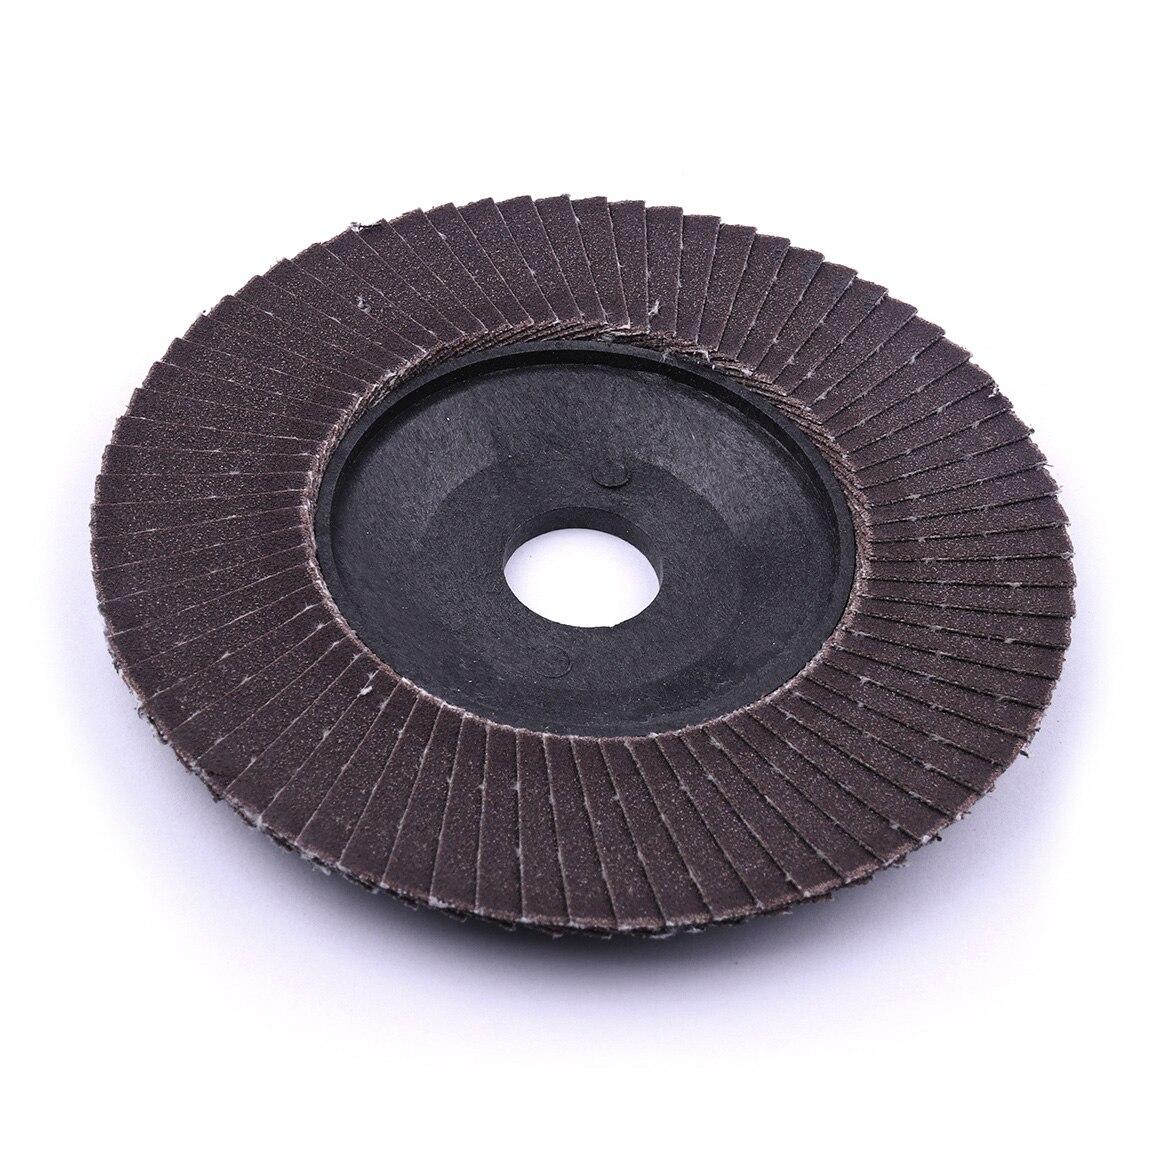 20 pièces 4 pouces rabat ponçage disque de meulage oxyde d'aluminium A/O 320/240/180/120/80 grain